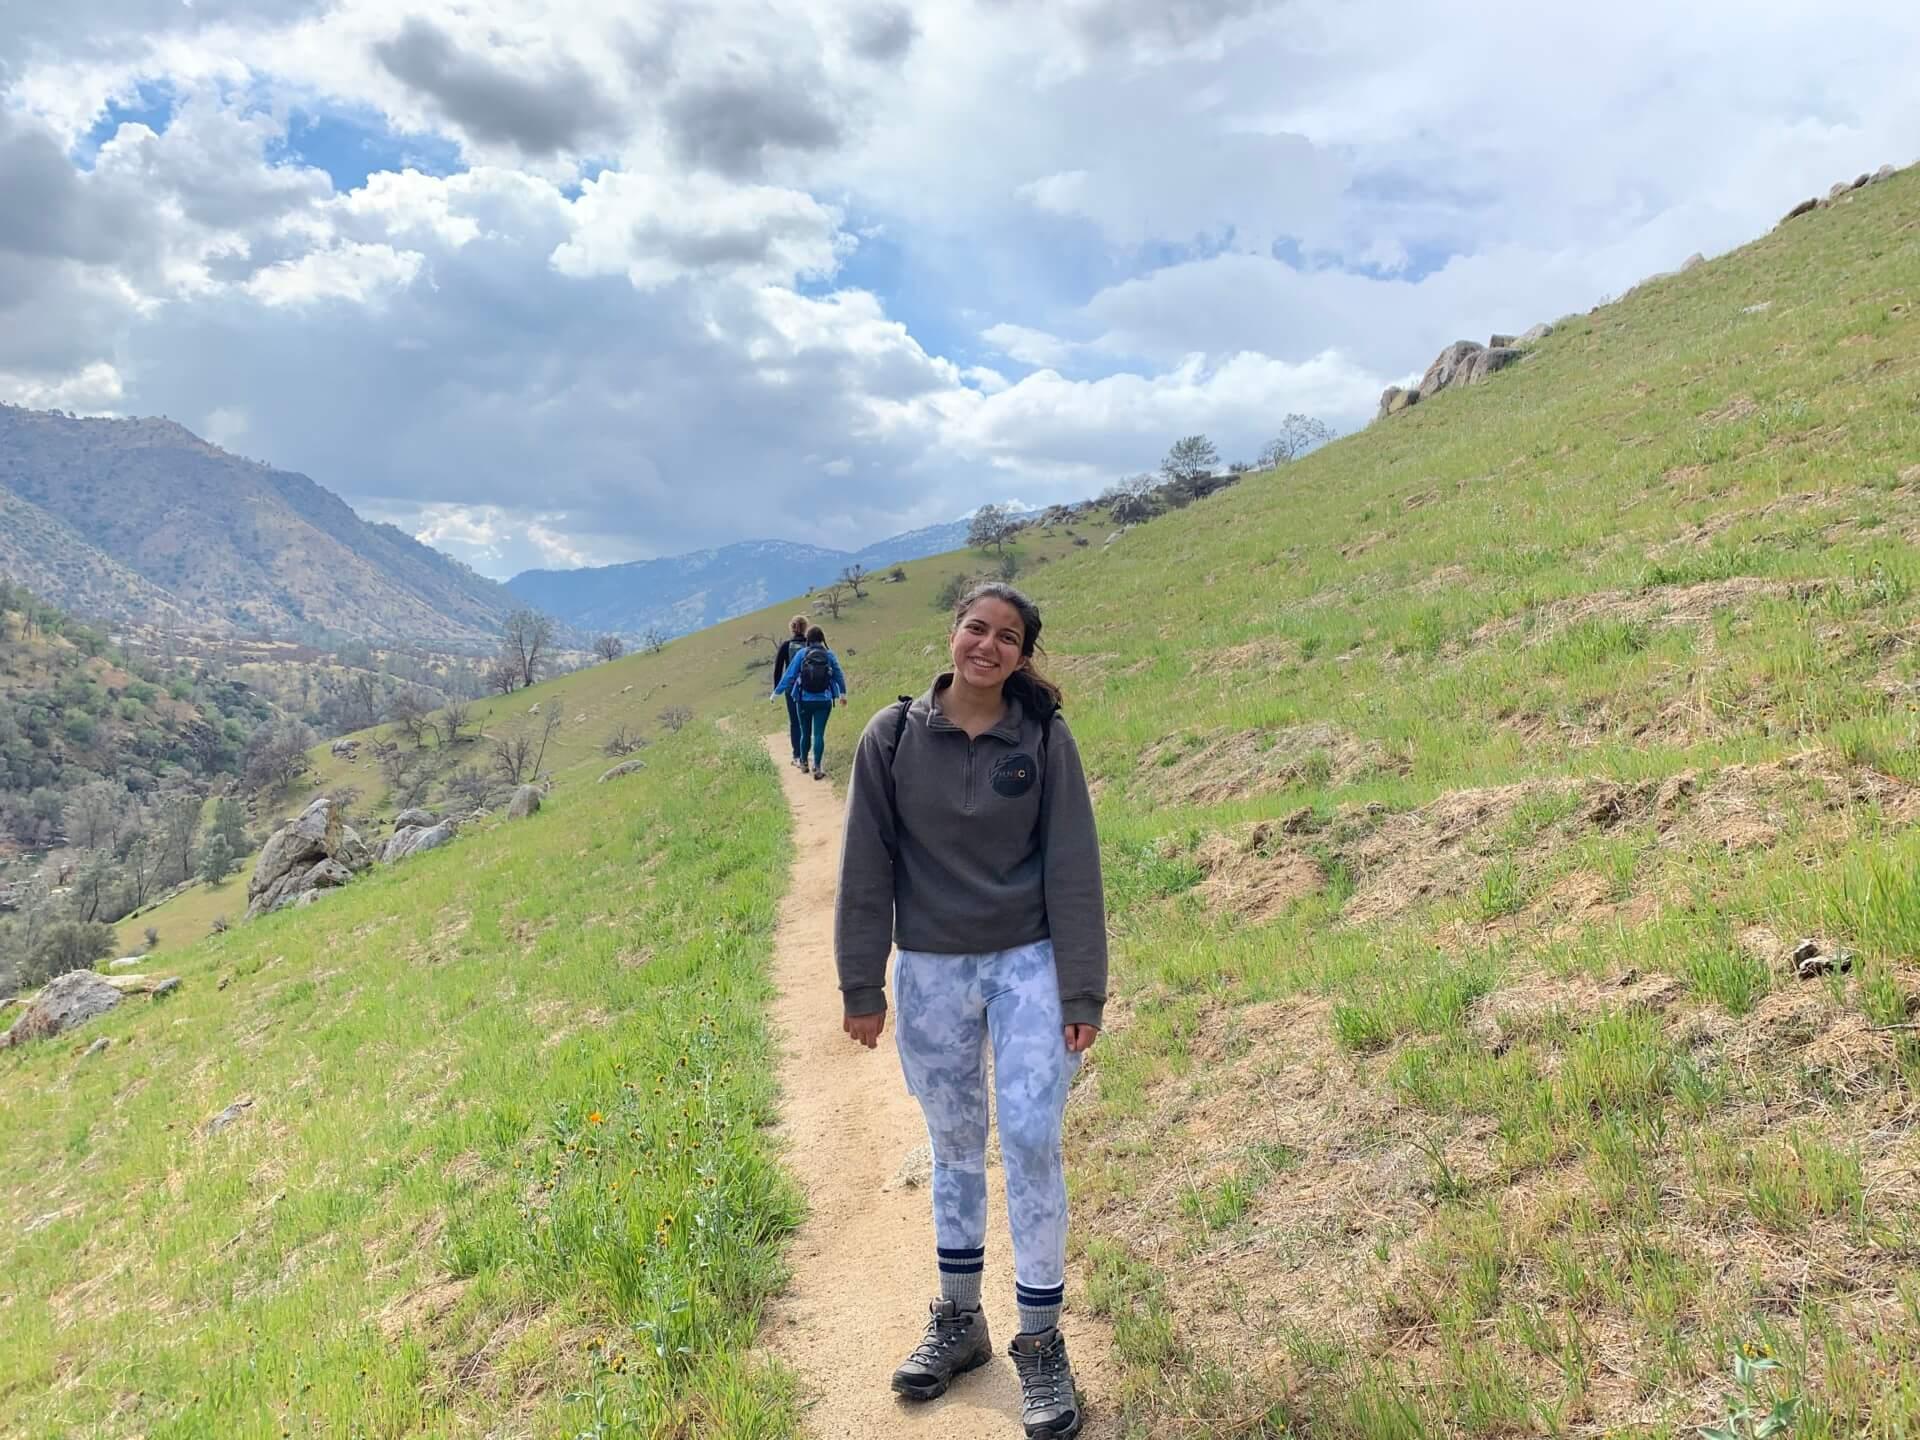 Spring Break 2.0: Wellness Days